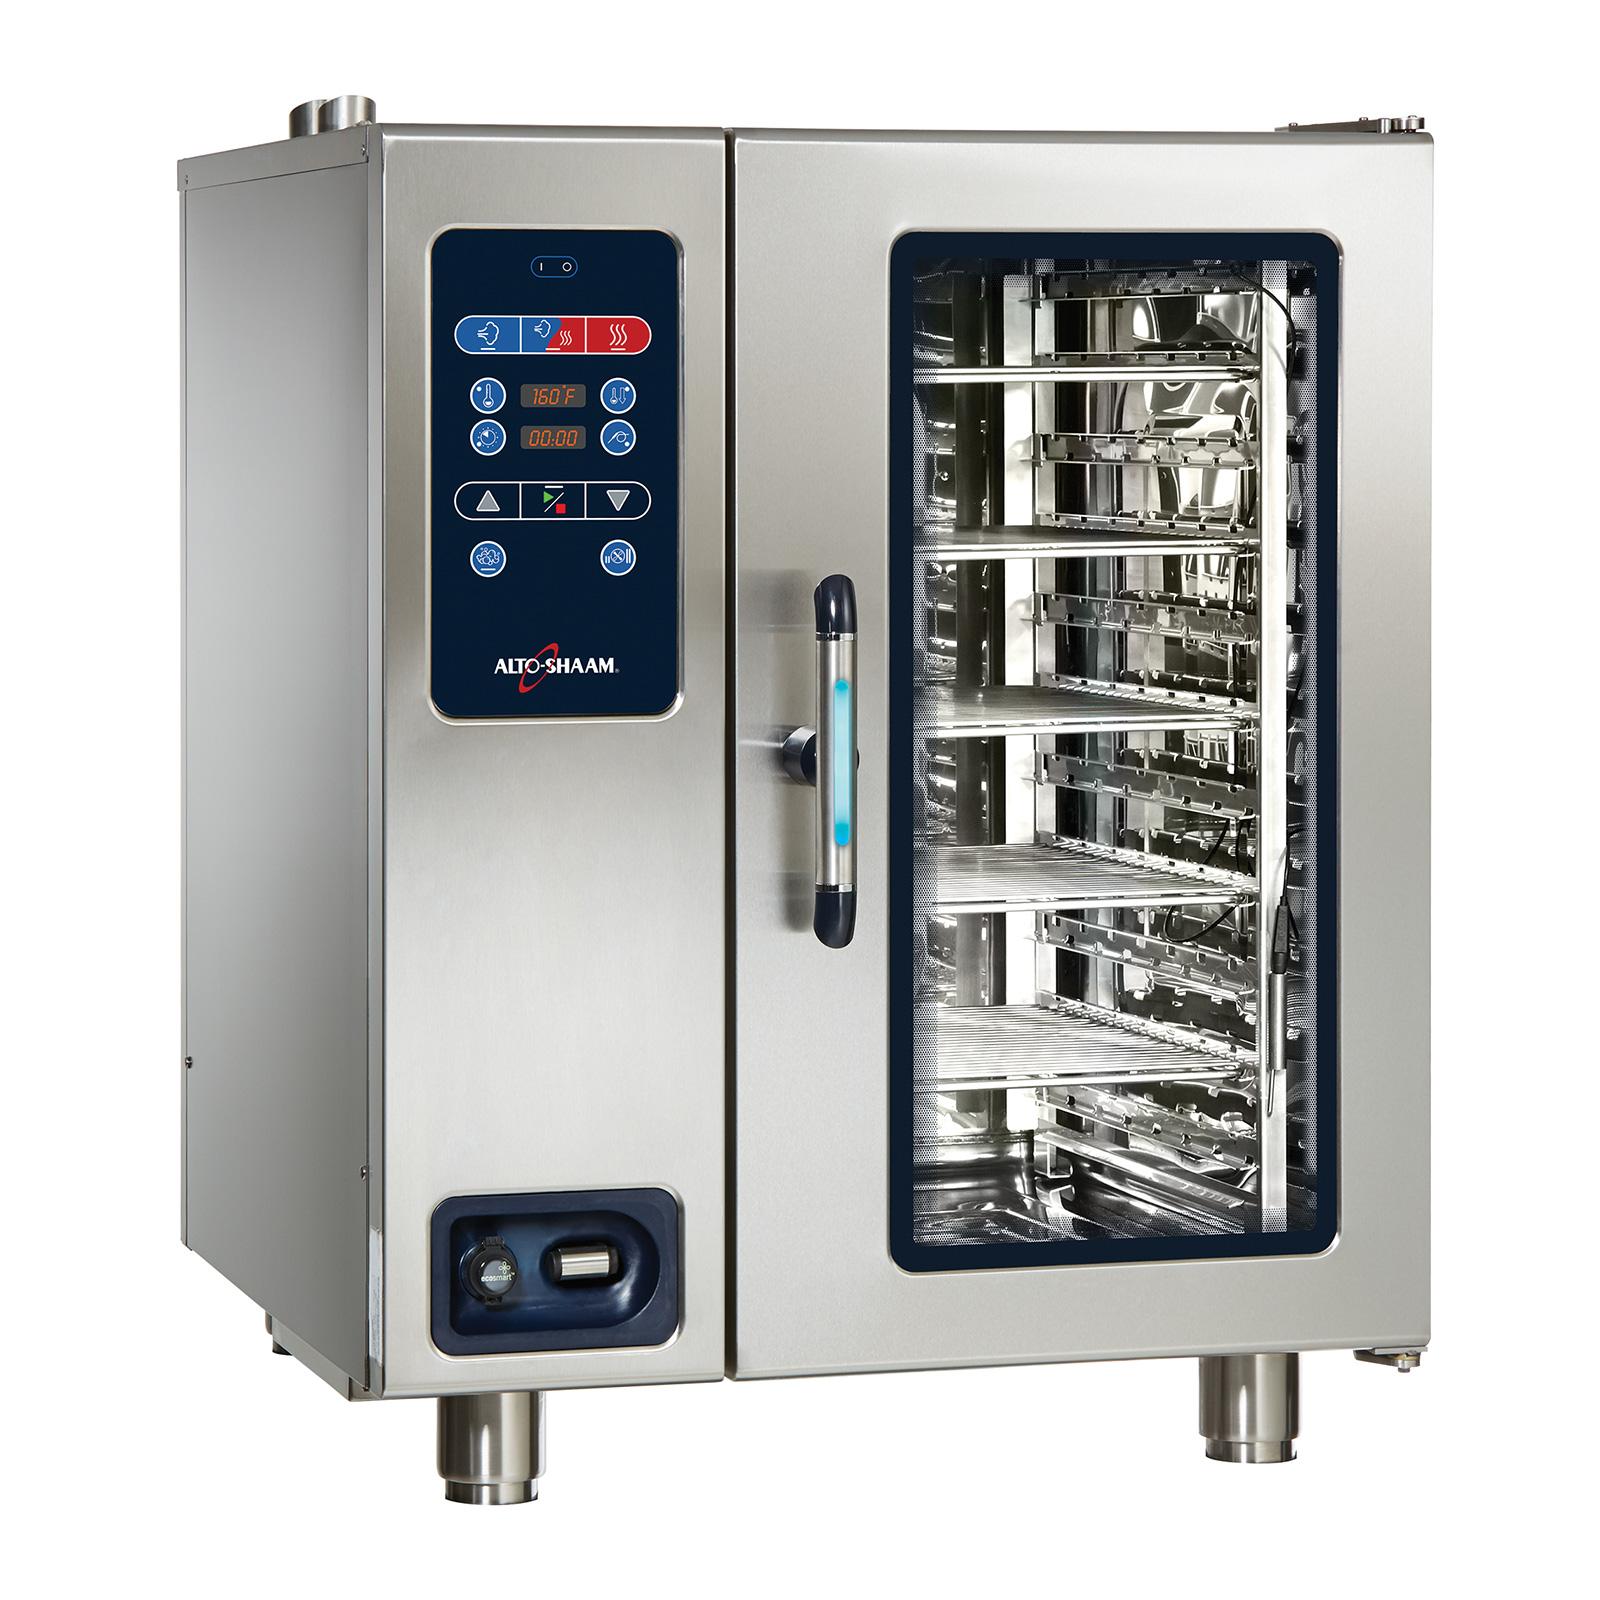 Alto-Shaam CTC10-10G combi oven, gas